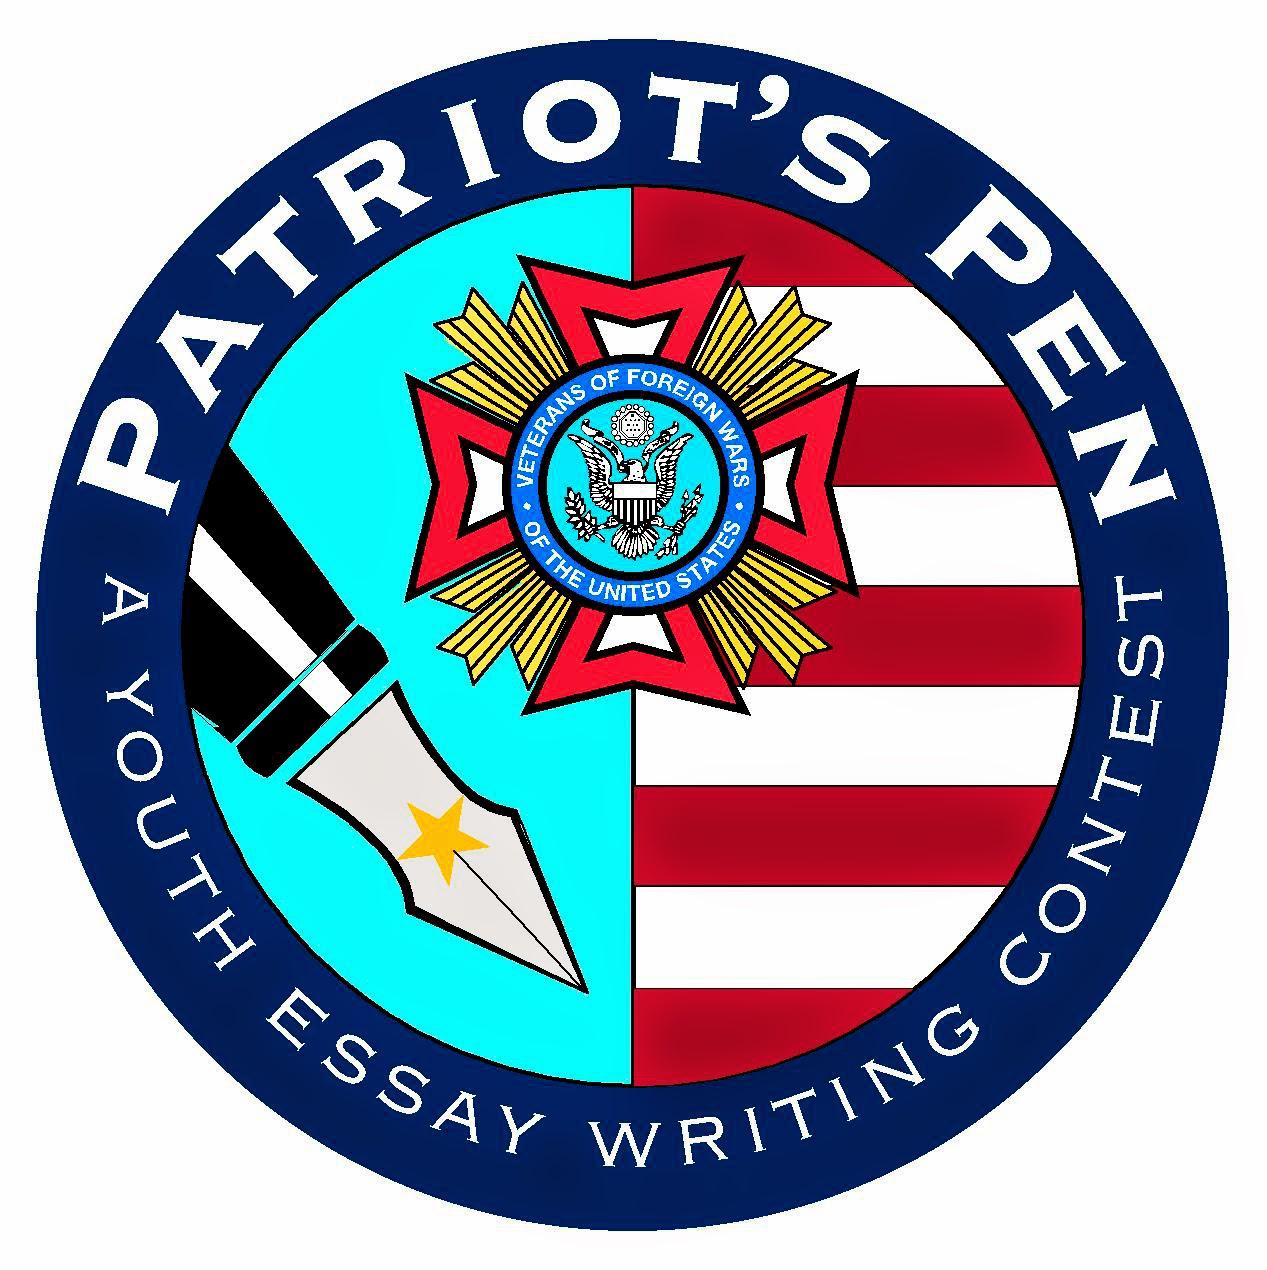 vfw patriots pen essay contest